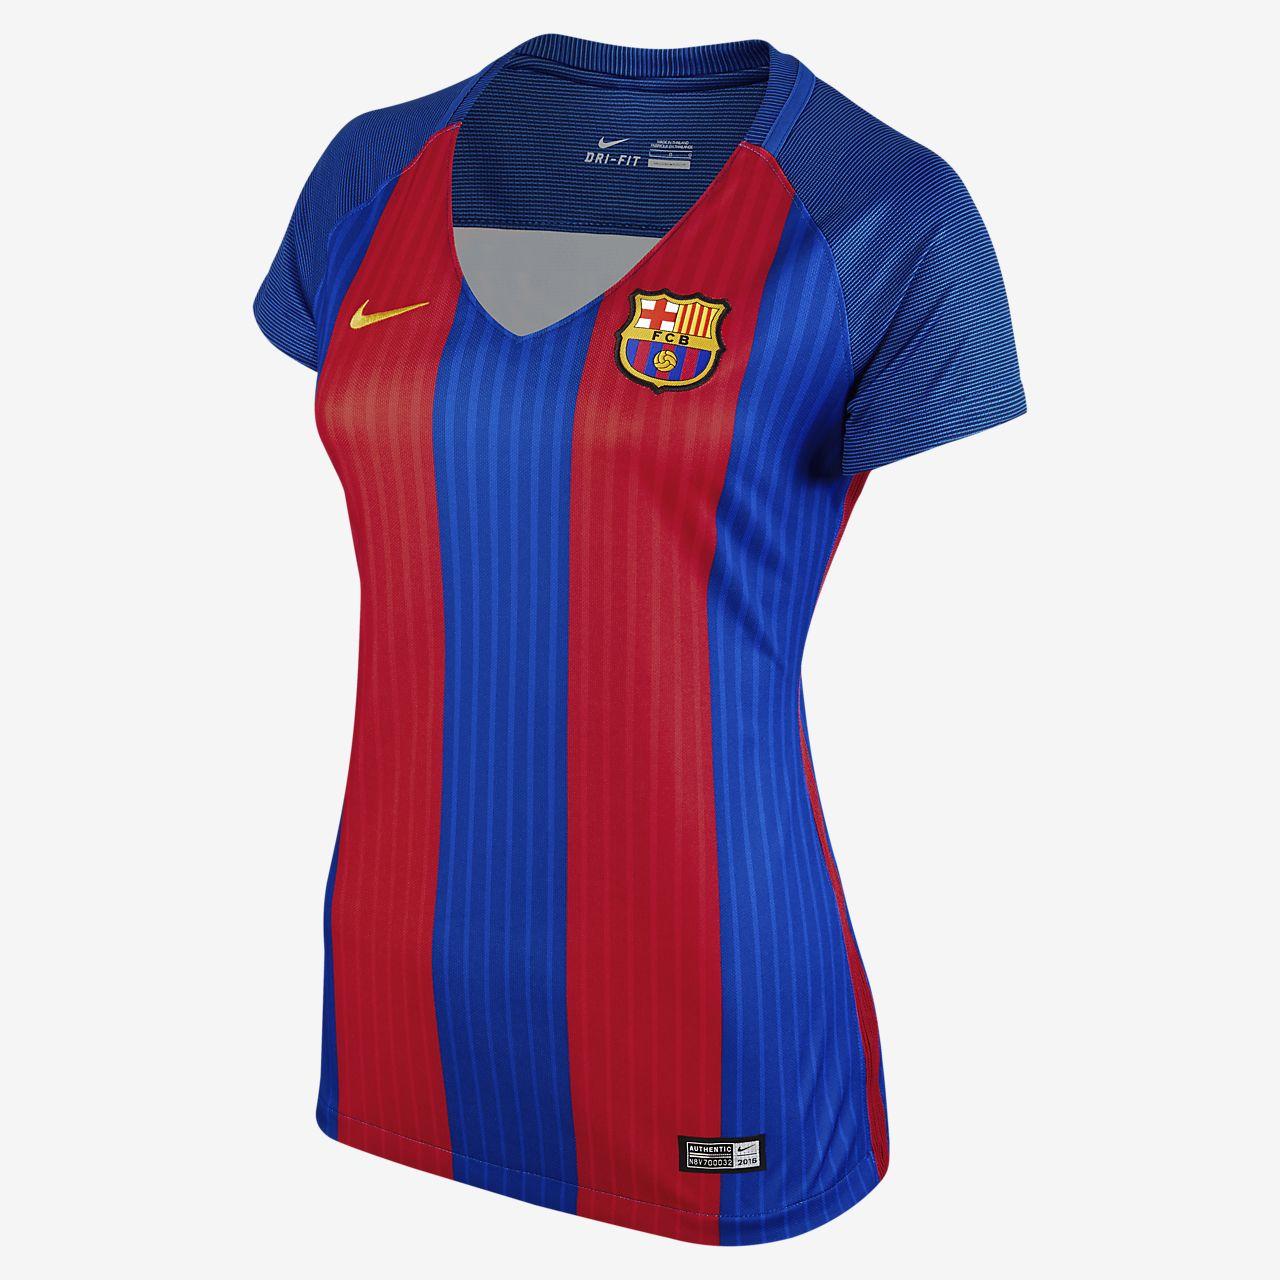 Maillot de football 2016/17 FC Barcelona Stadium Home pour Femme